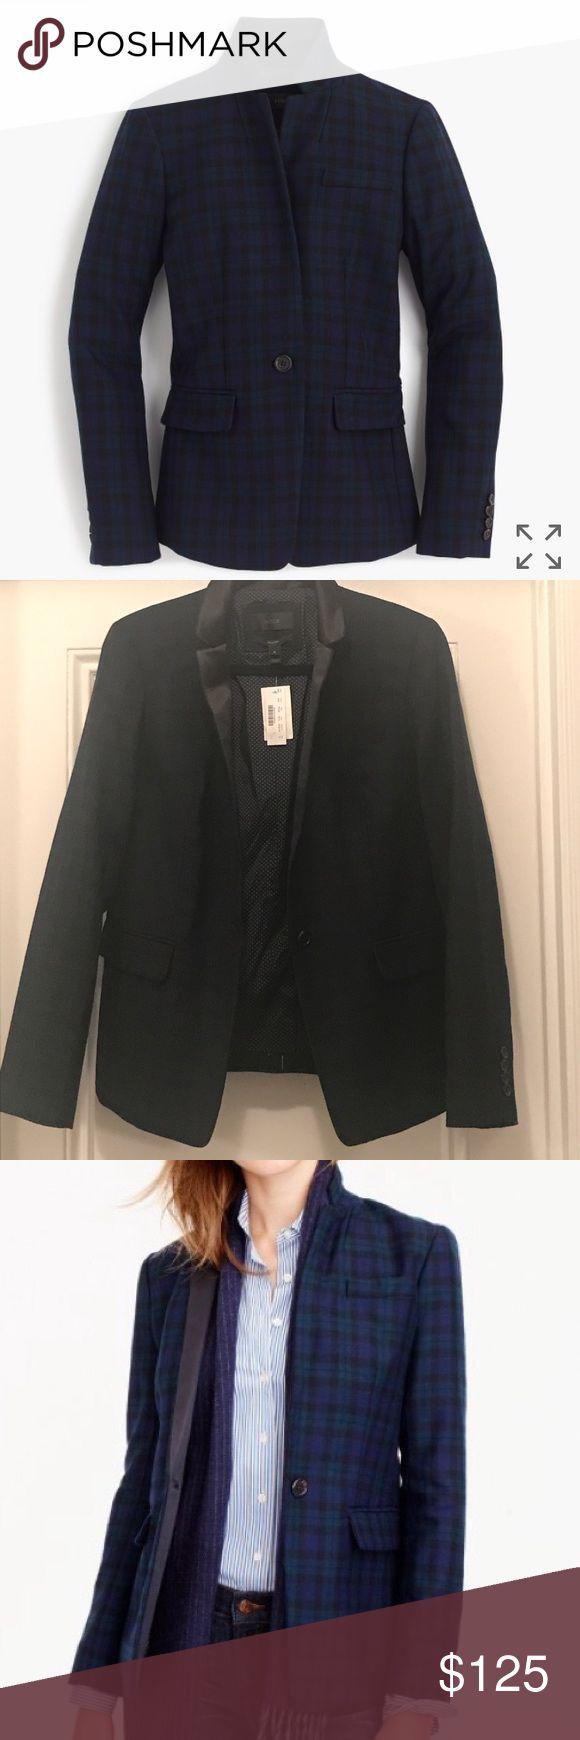 J Crew Collection Plaid Black Satin Regent Tuxedo J Crew Collection Green & Navy Blue Plaid Regent Tuxedo 1-Button Blazer with Black Satin Labels and inside pocket J. Crew Jackets & Coats Blazers